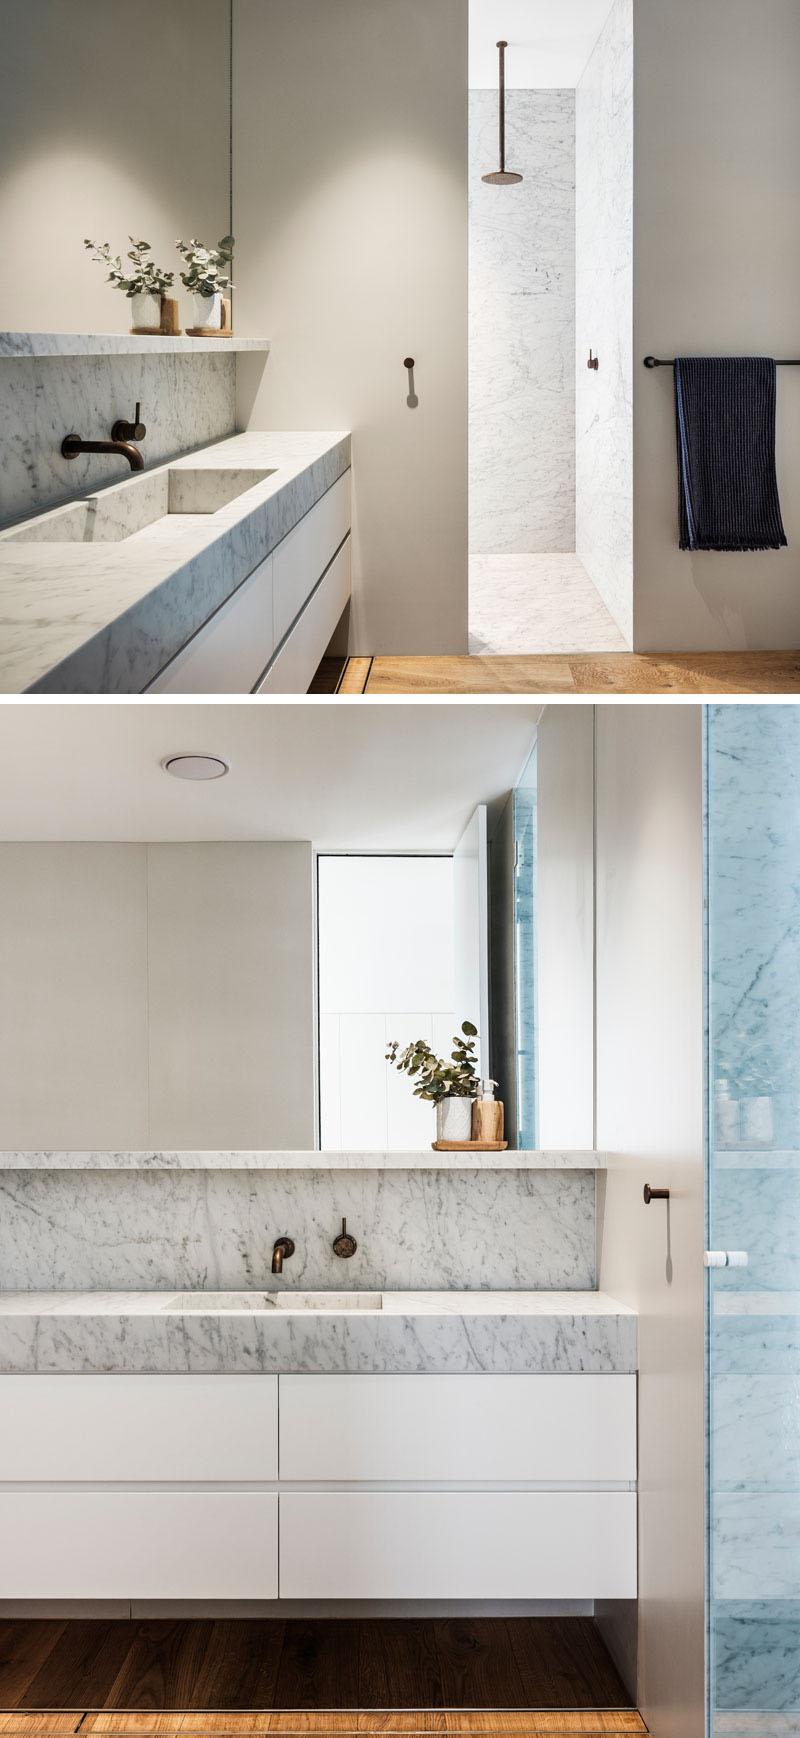 Второй дом в Куги, Австралия, от компании «Madeleine Blanchfield Architects»